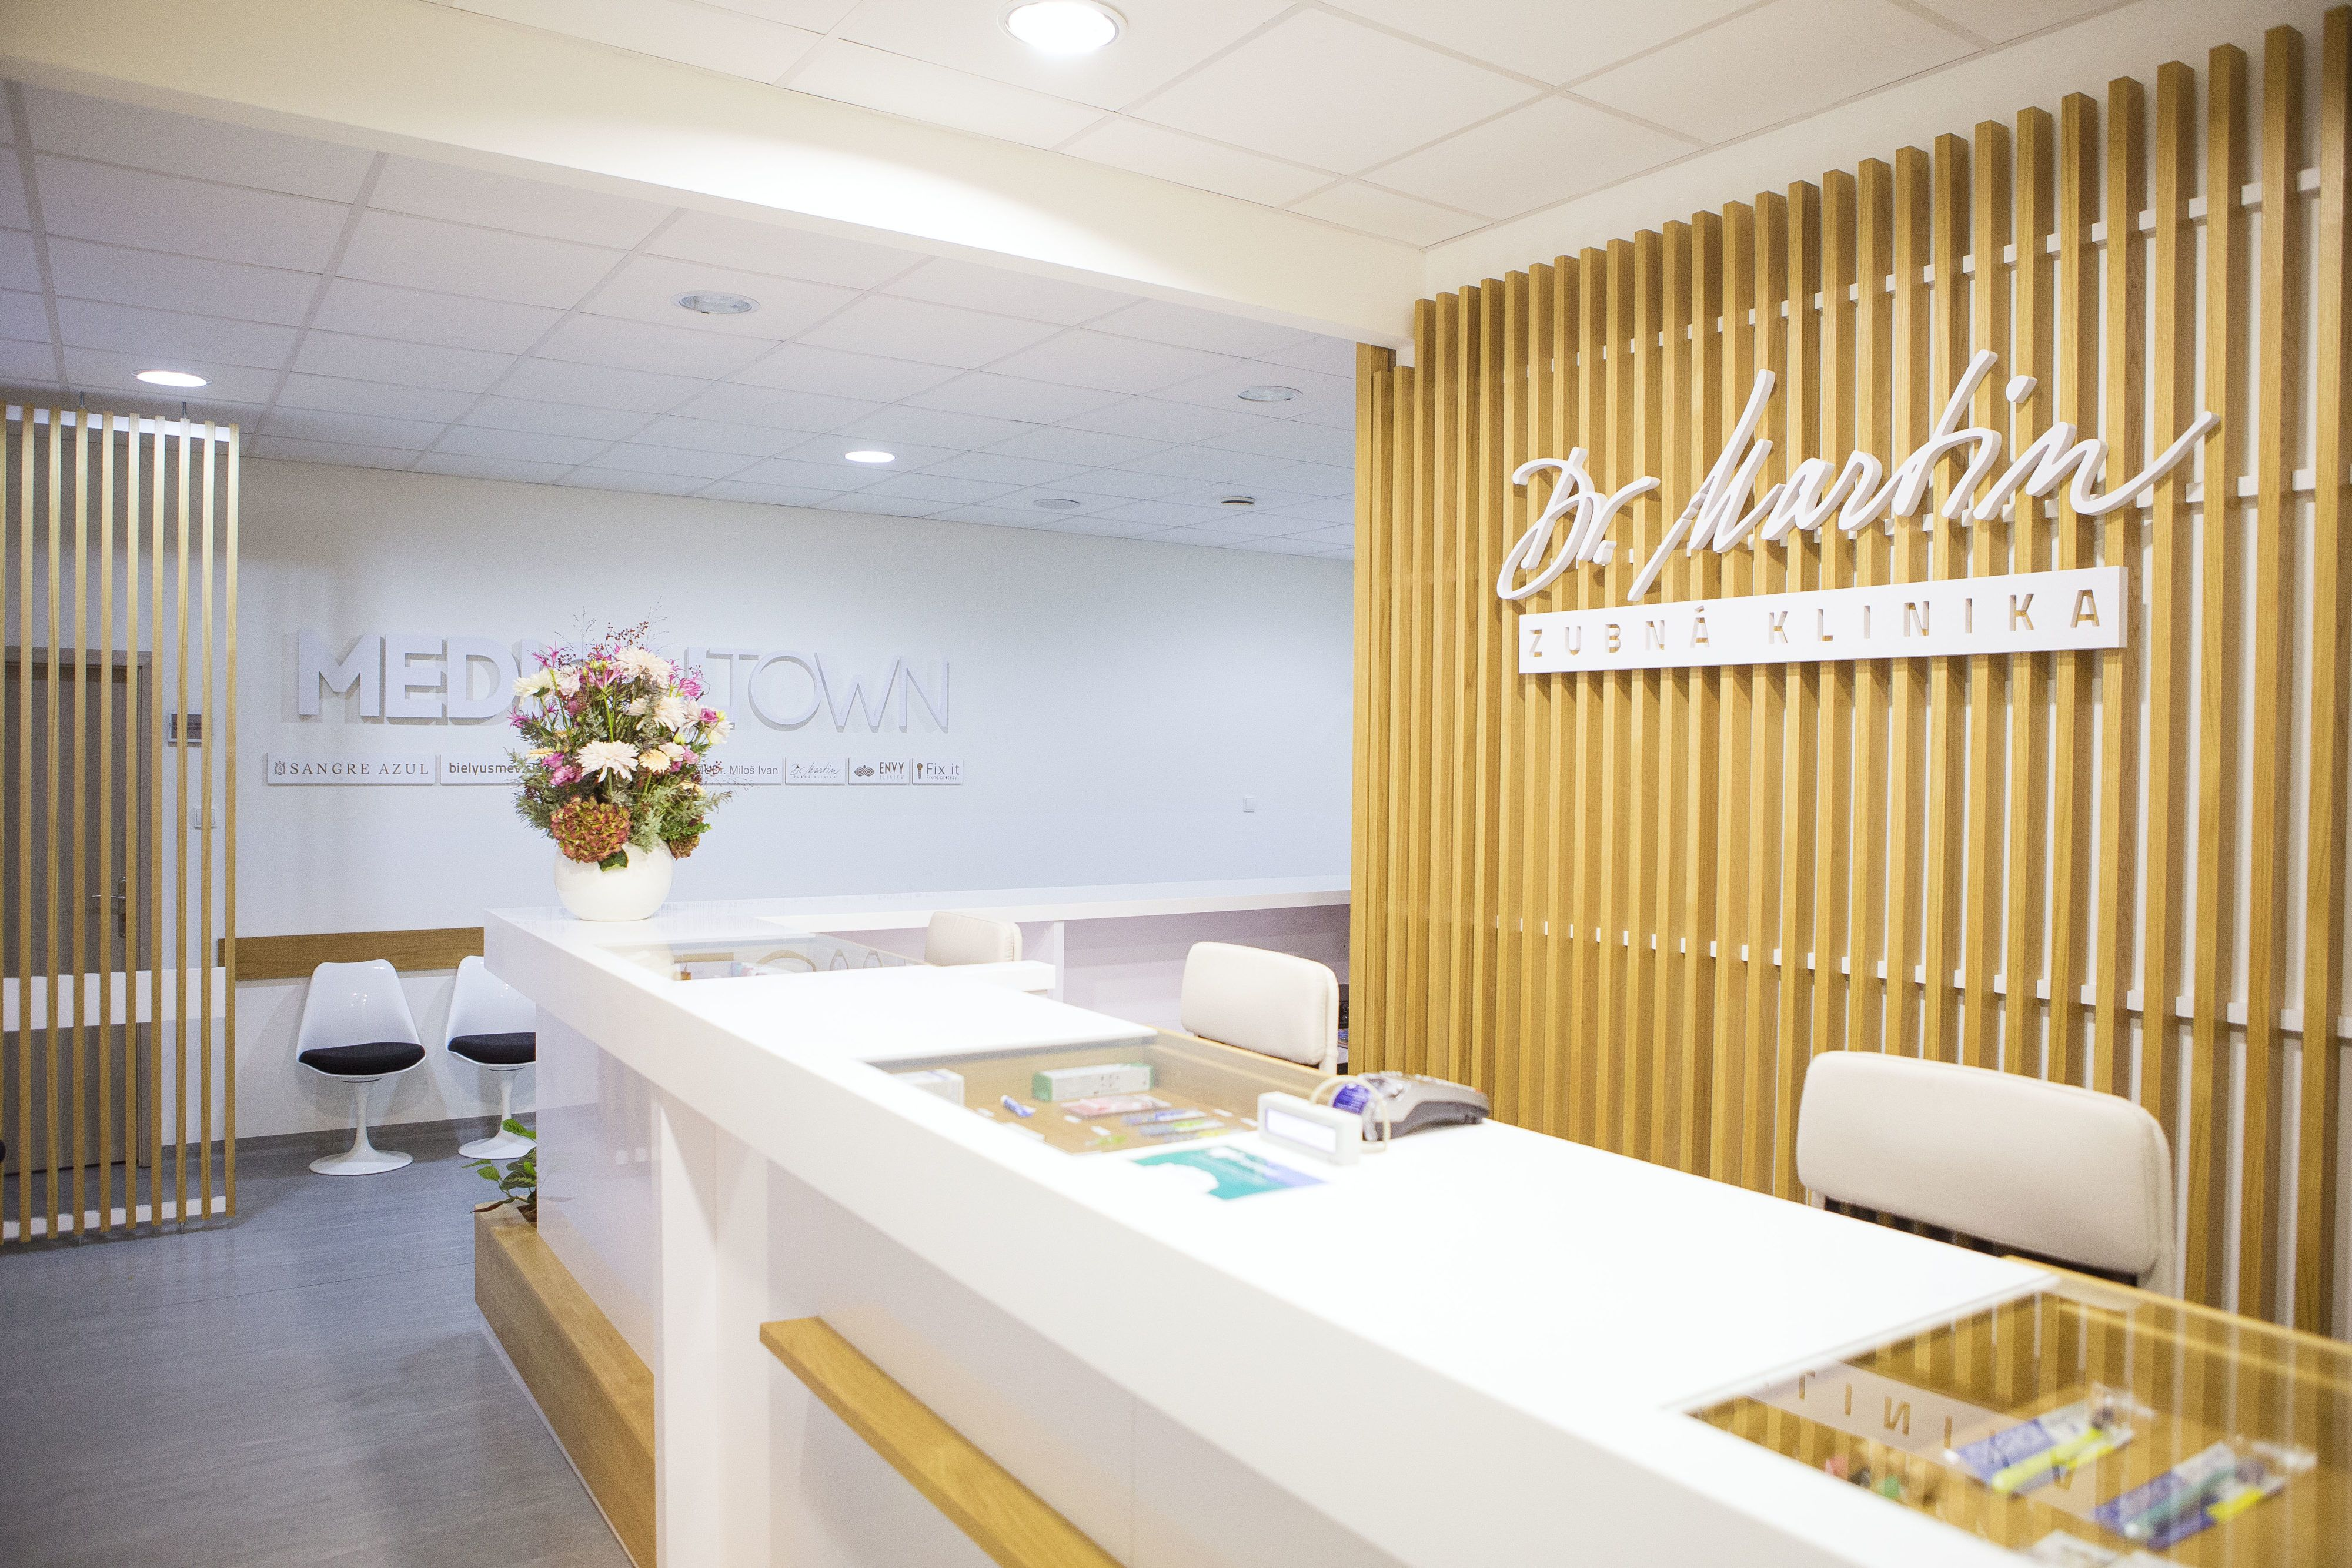 dr_martin_dental_clinic